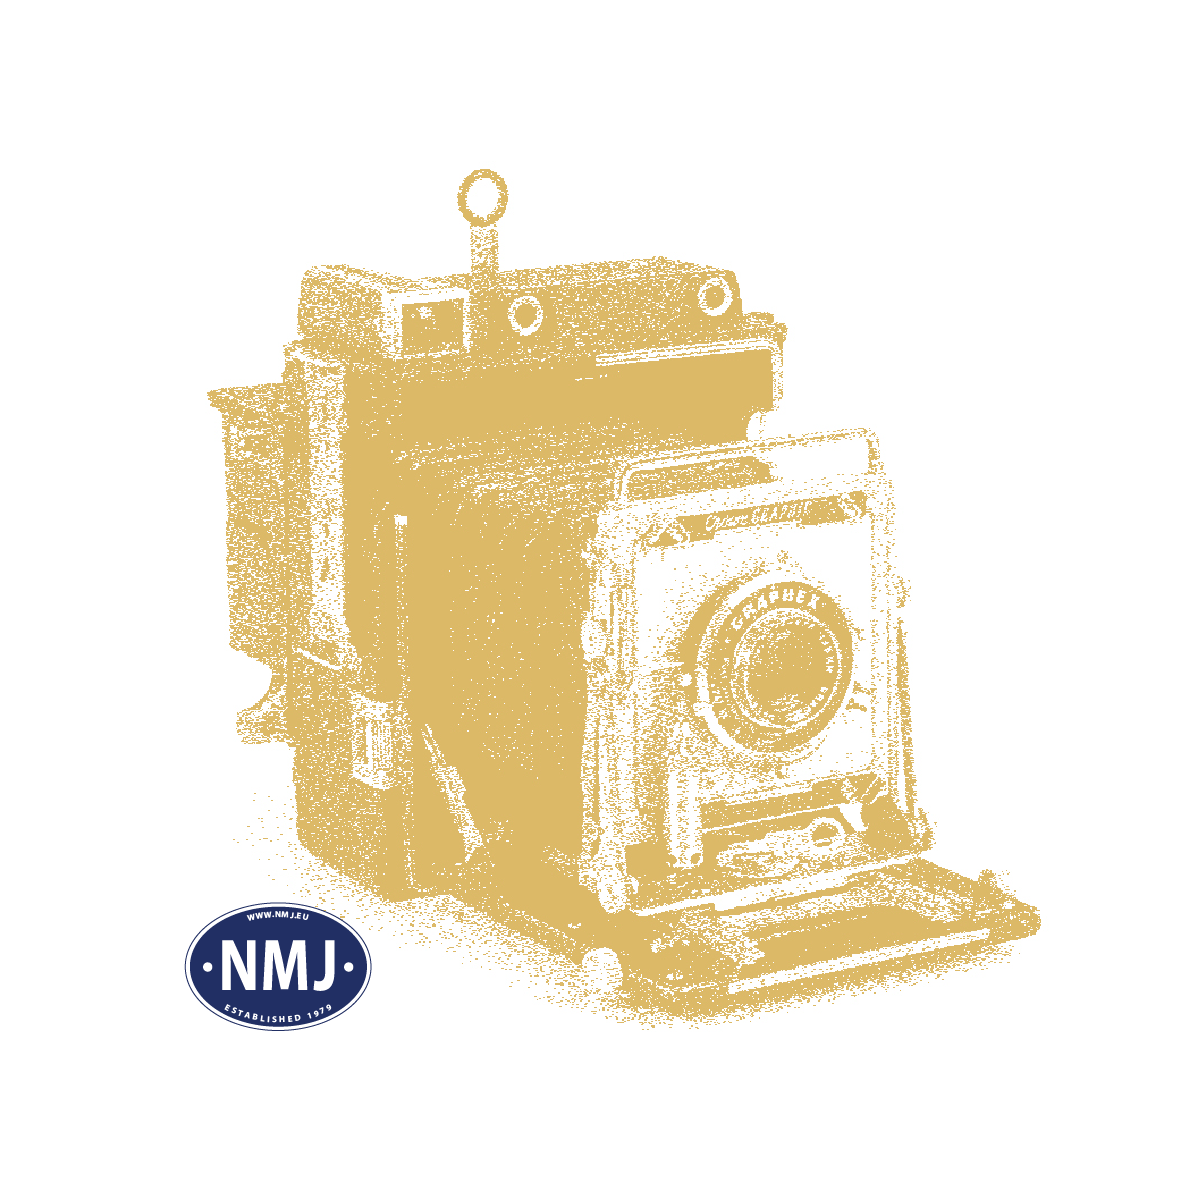 NMJT90017 - NMJ Topline NSB Di3a.605 New Design OL- Logo 1994, DC